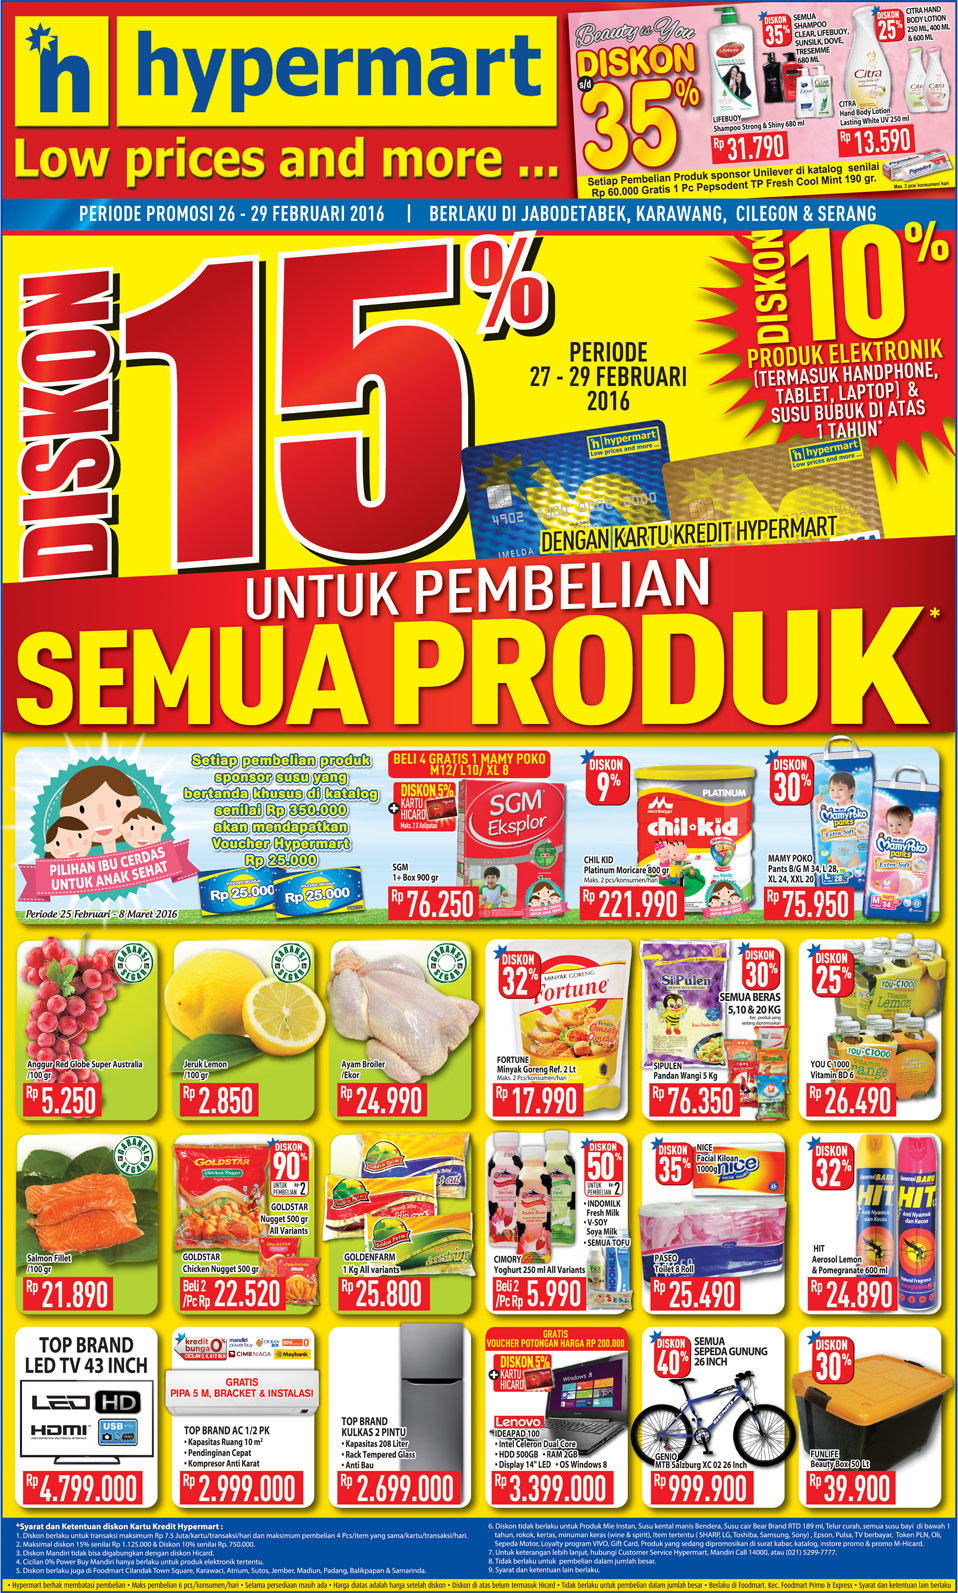 Katalog Promo Diskon Hypermart 26 29 Februari 2016 Katalog Promo